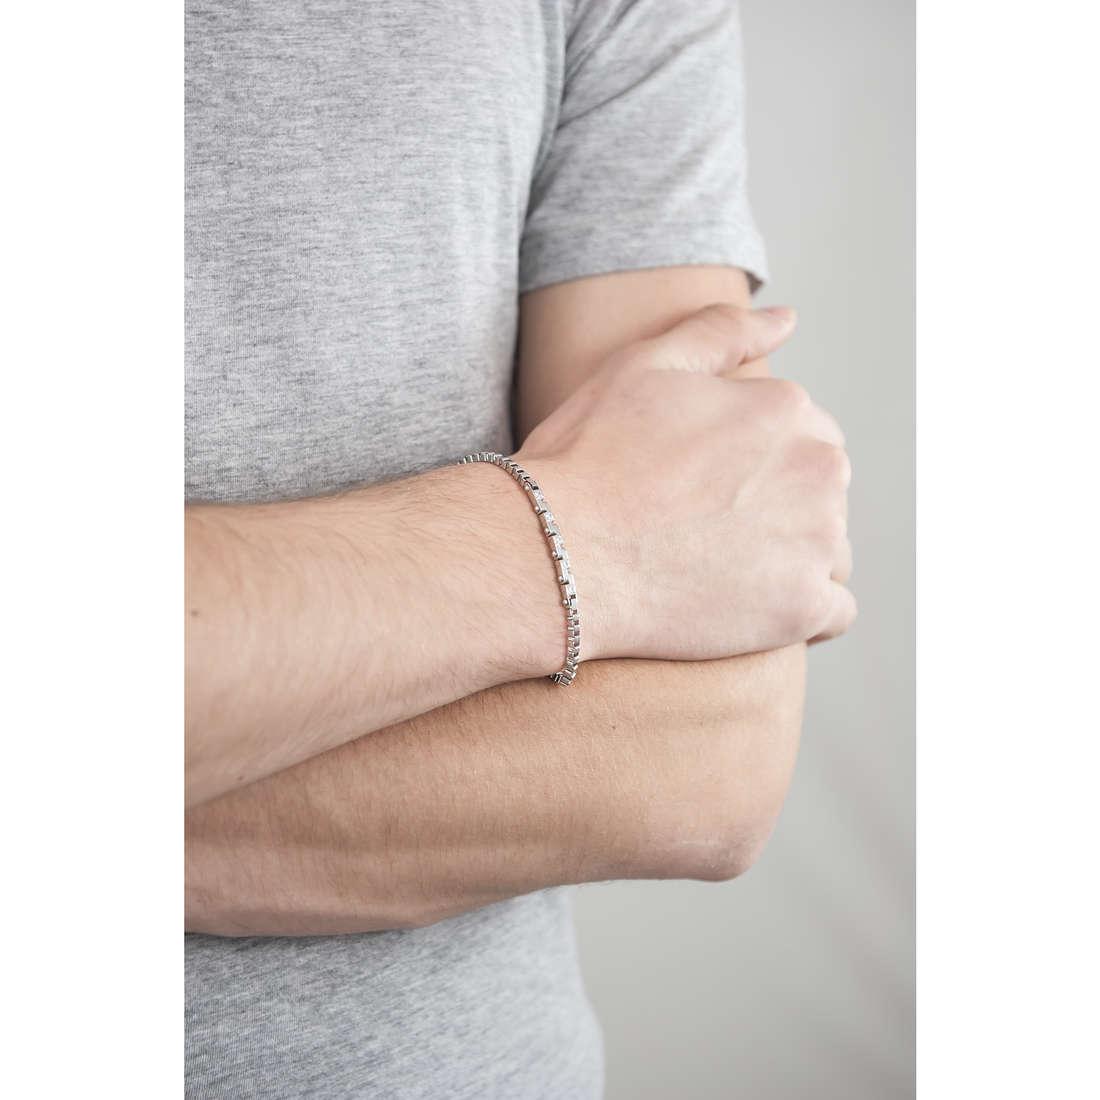 Morellato bracciali Alfa uomo SAEV09 indosso